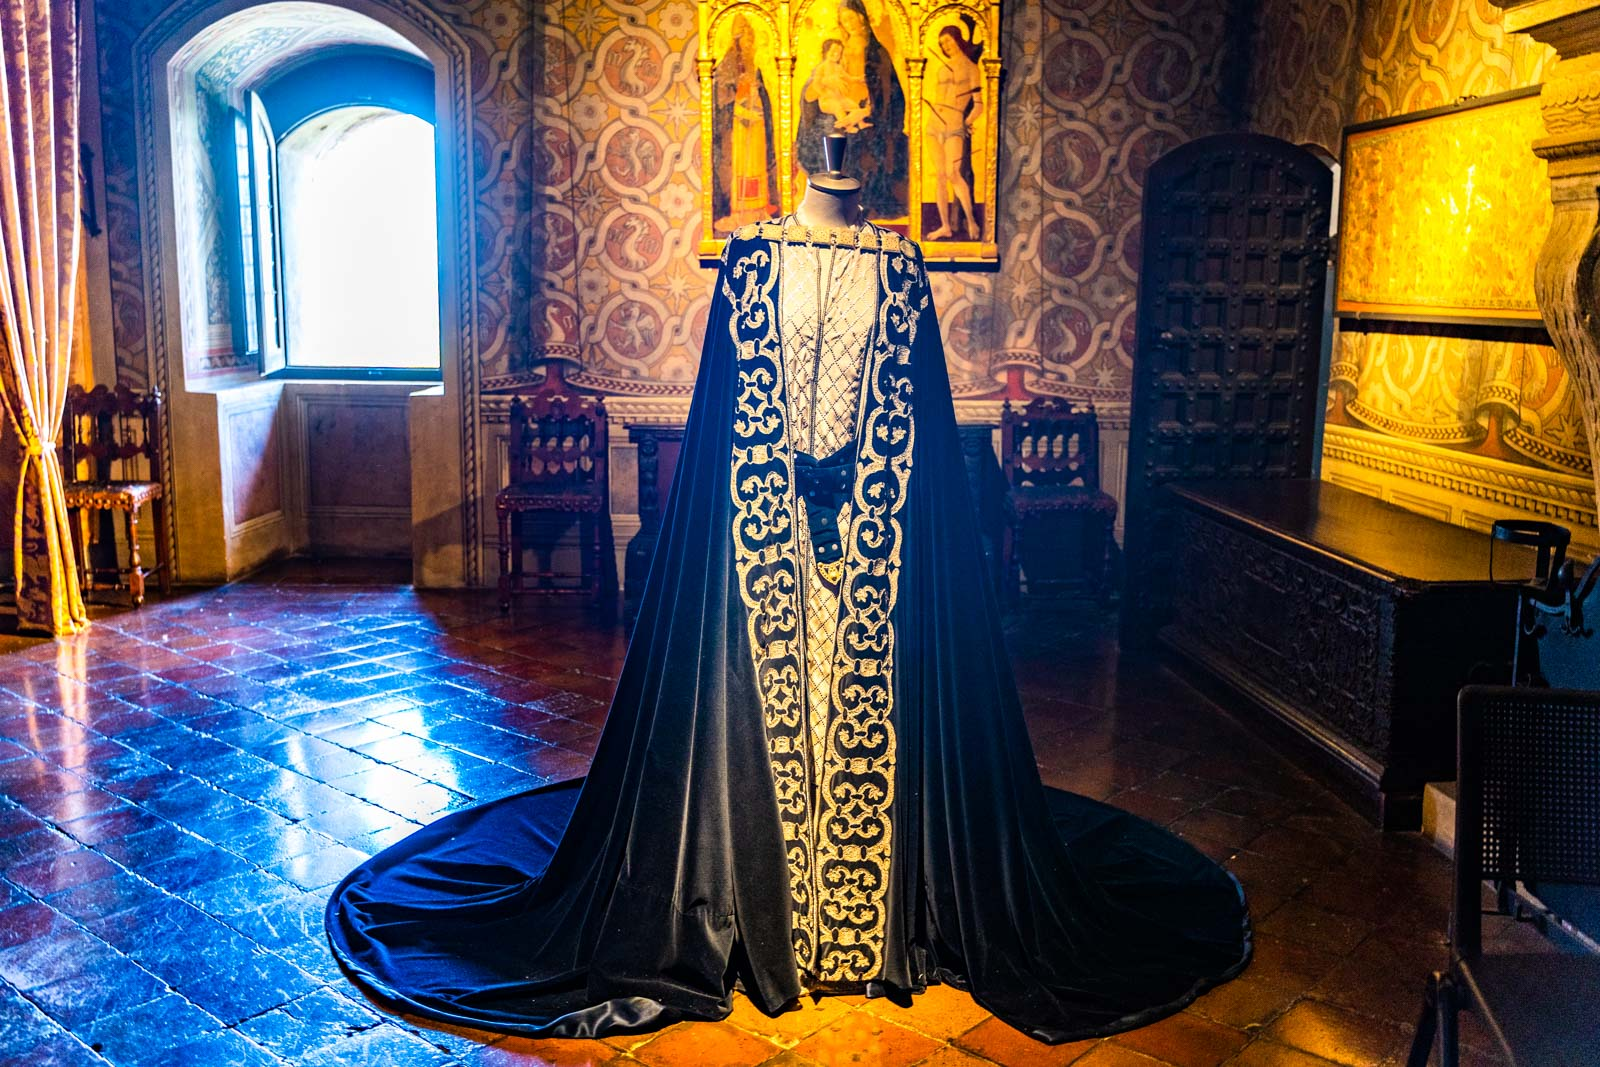 abito francesca